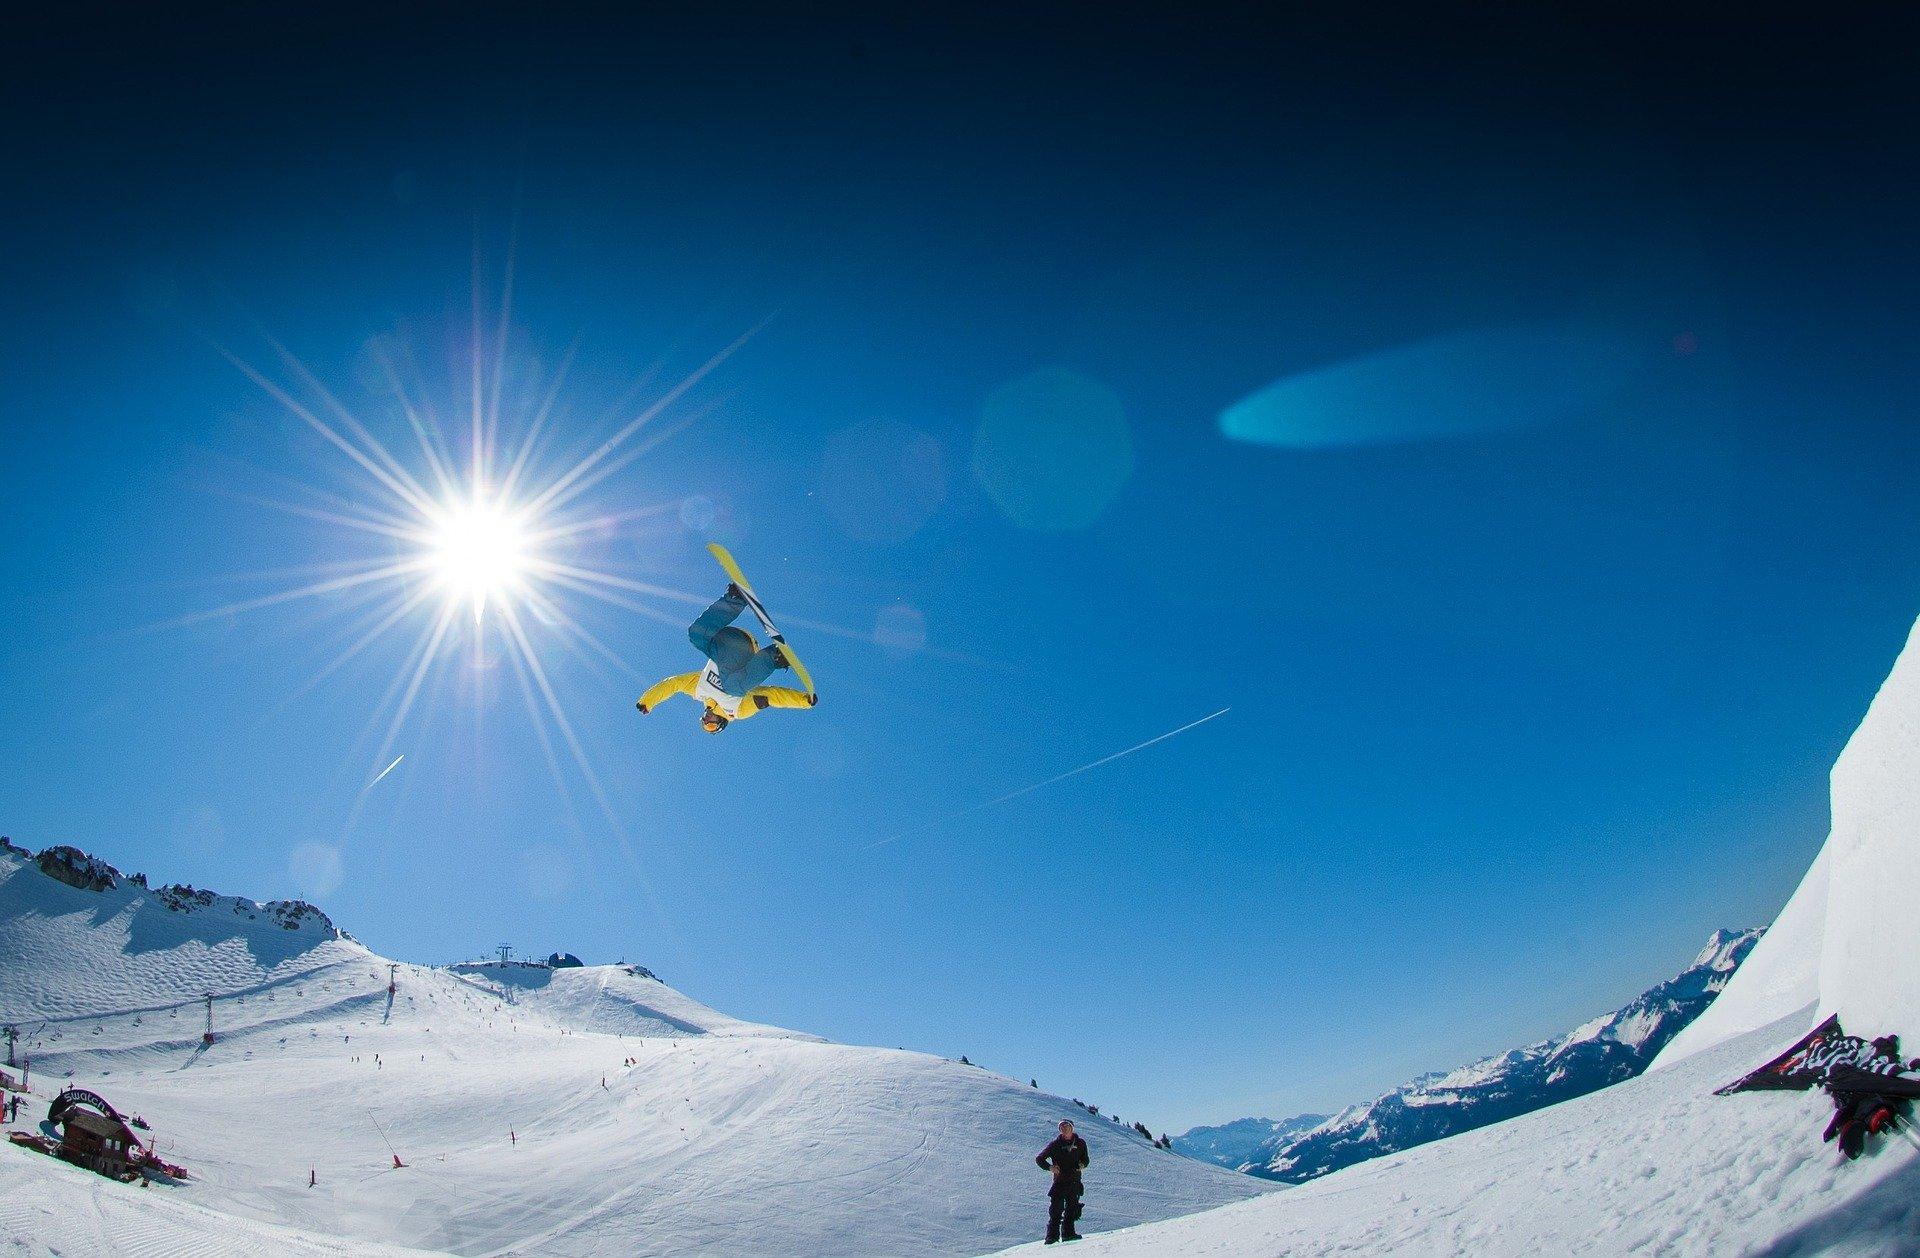 Snowboarding in Mammoth